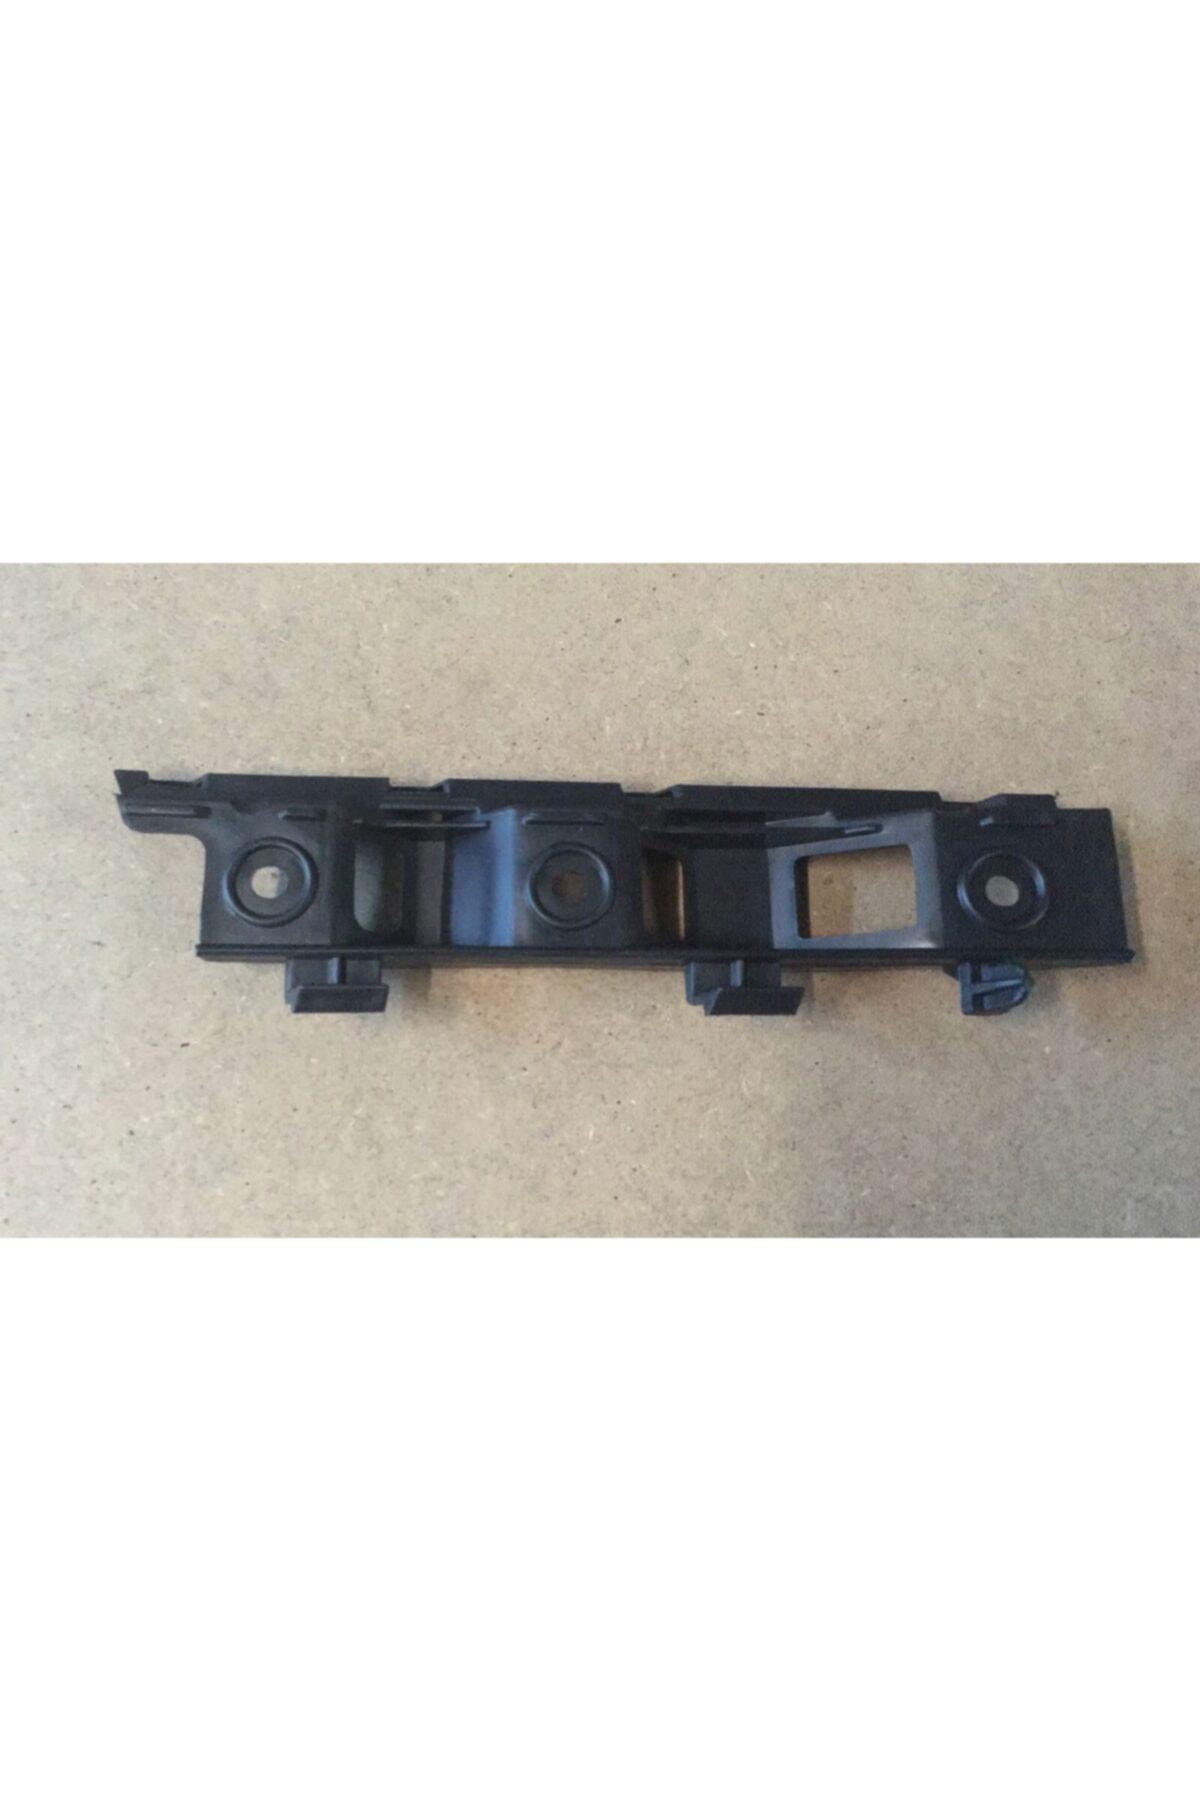 DMR Passat Tampon Braketi Ön Orta Sol 3c0807183 Bc3c0807183 Otodemır 2